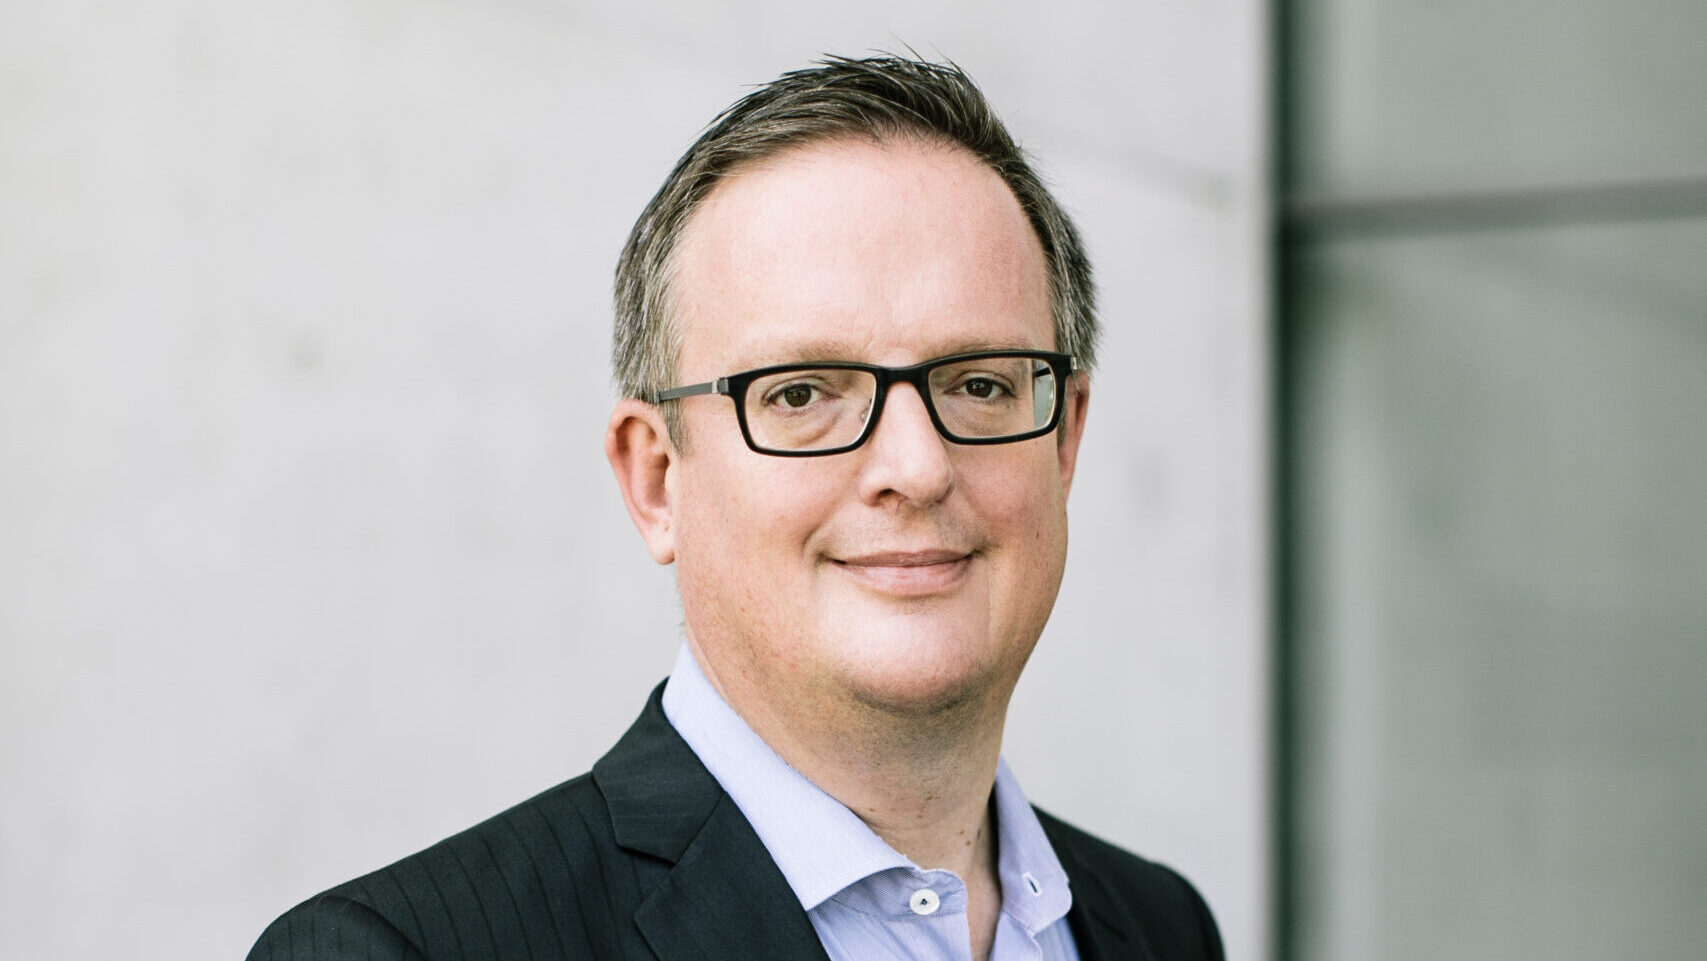 Dr. iur. Hannes Hartung TEP